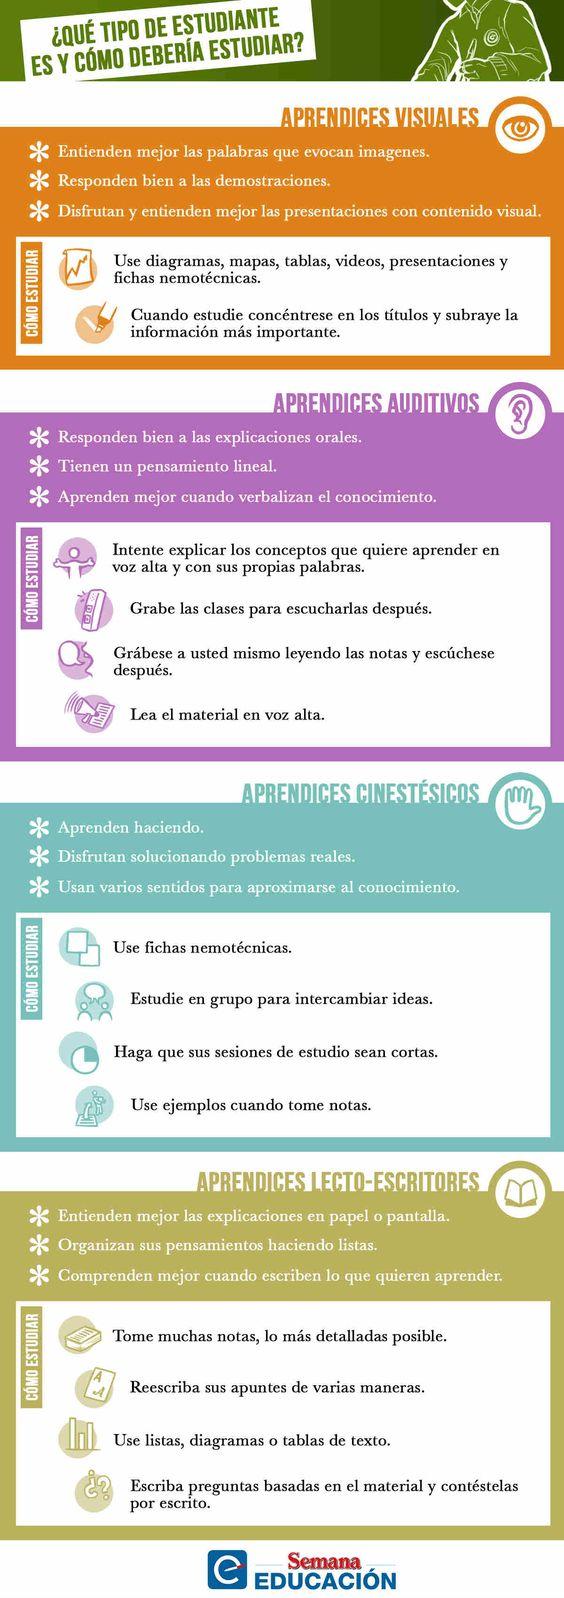 comoestudiarsegunestiloaprendizaje-infografia-bloggesvin